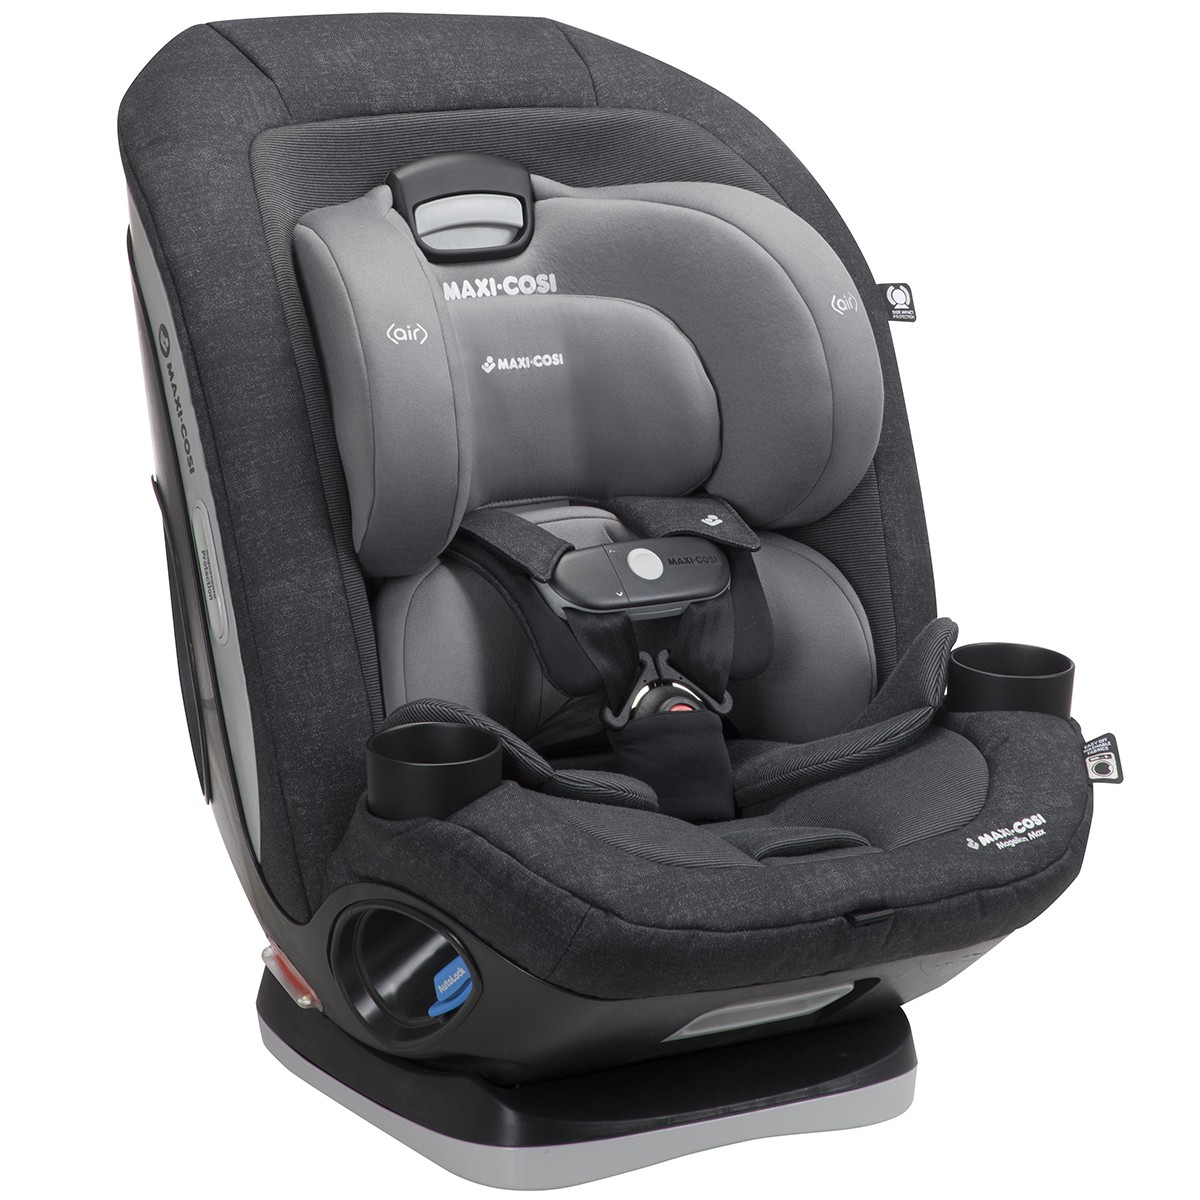 Silla De Auto Convertible Magellan Max Nomad Black Maxi Cosi Maxi Cosi Babytuto